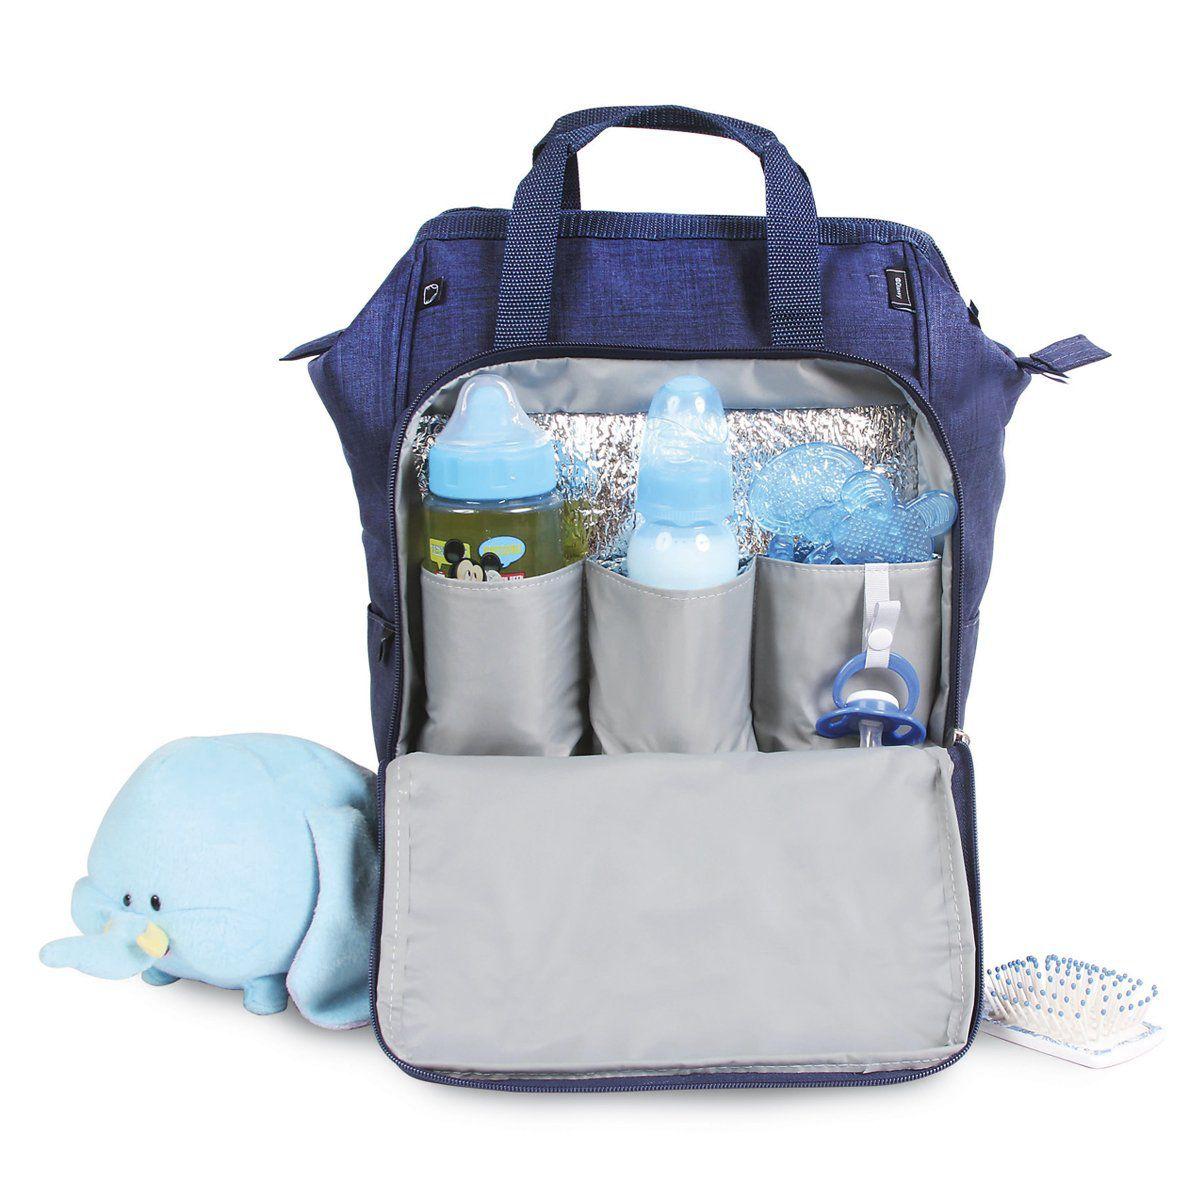 Kit Baby Bag Mochila + Porta Mamadeira Mickey Mouse Azul c/ Trocador Disney